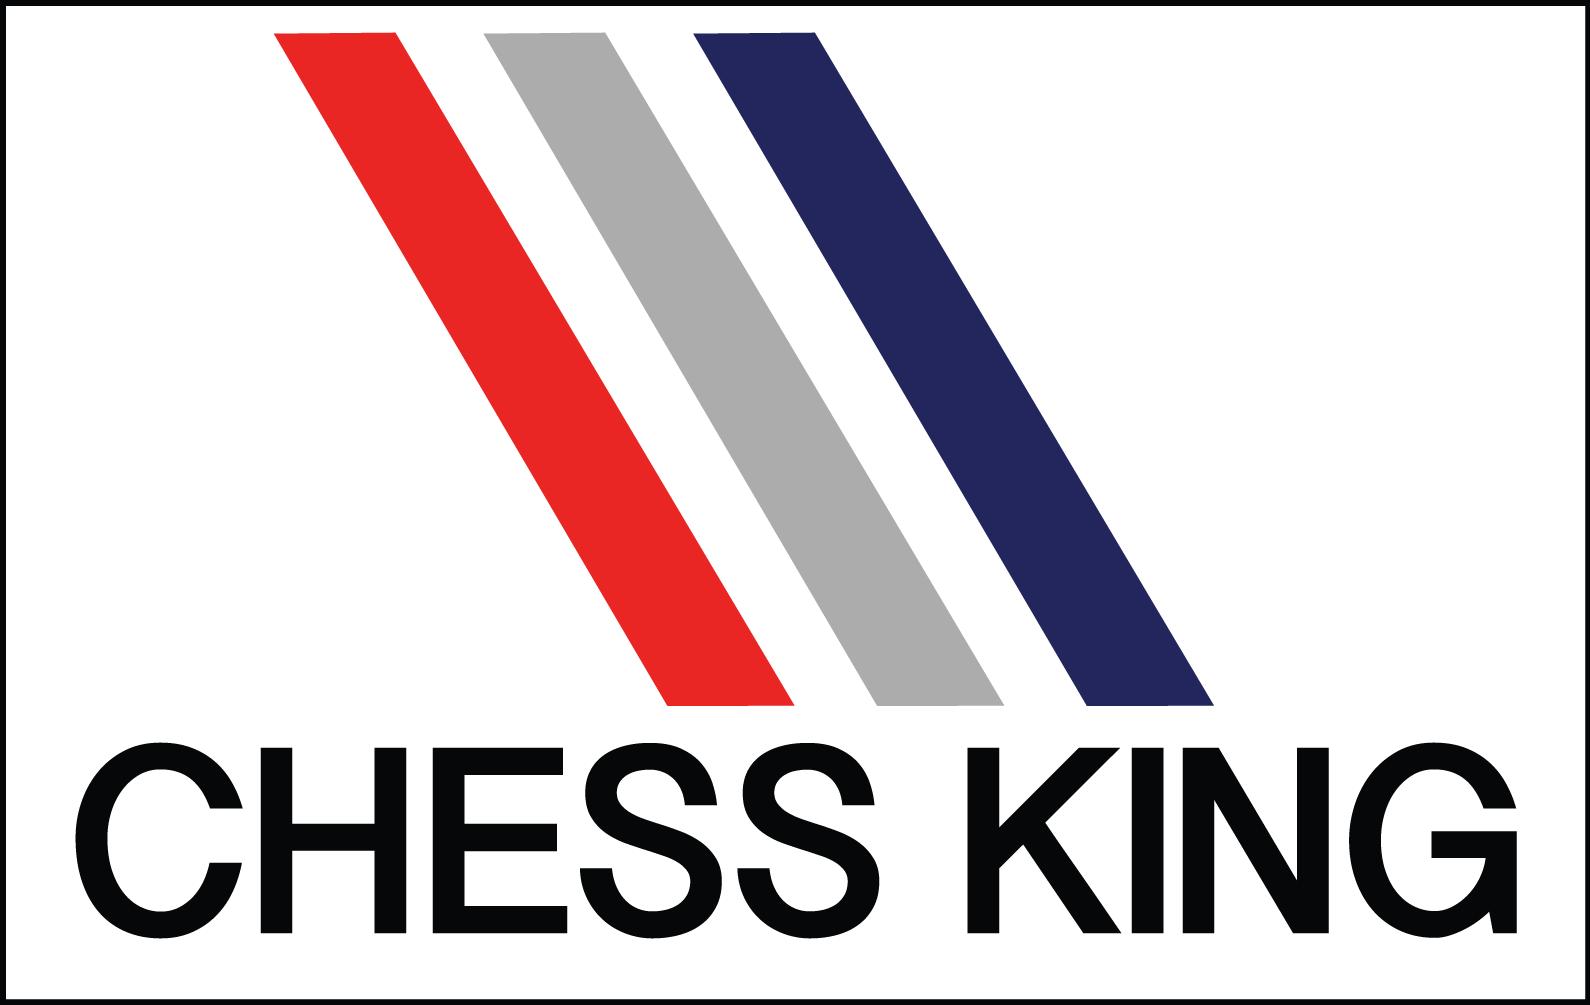 Chess_king2